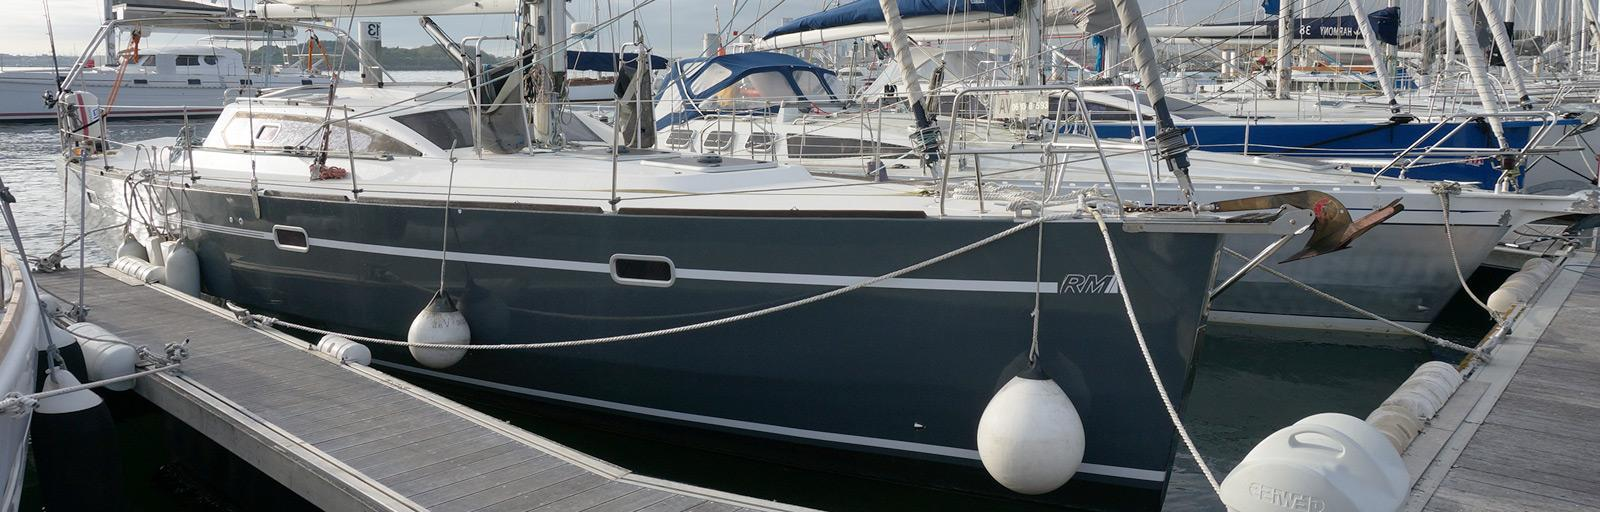 RM 1200 - AYC Yachtbroker